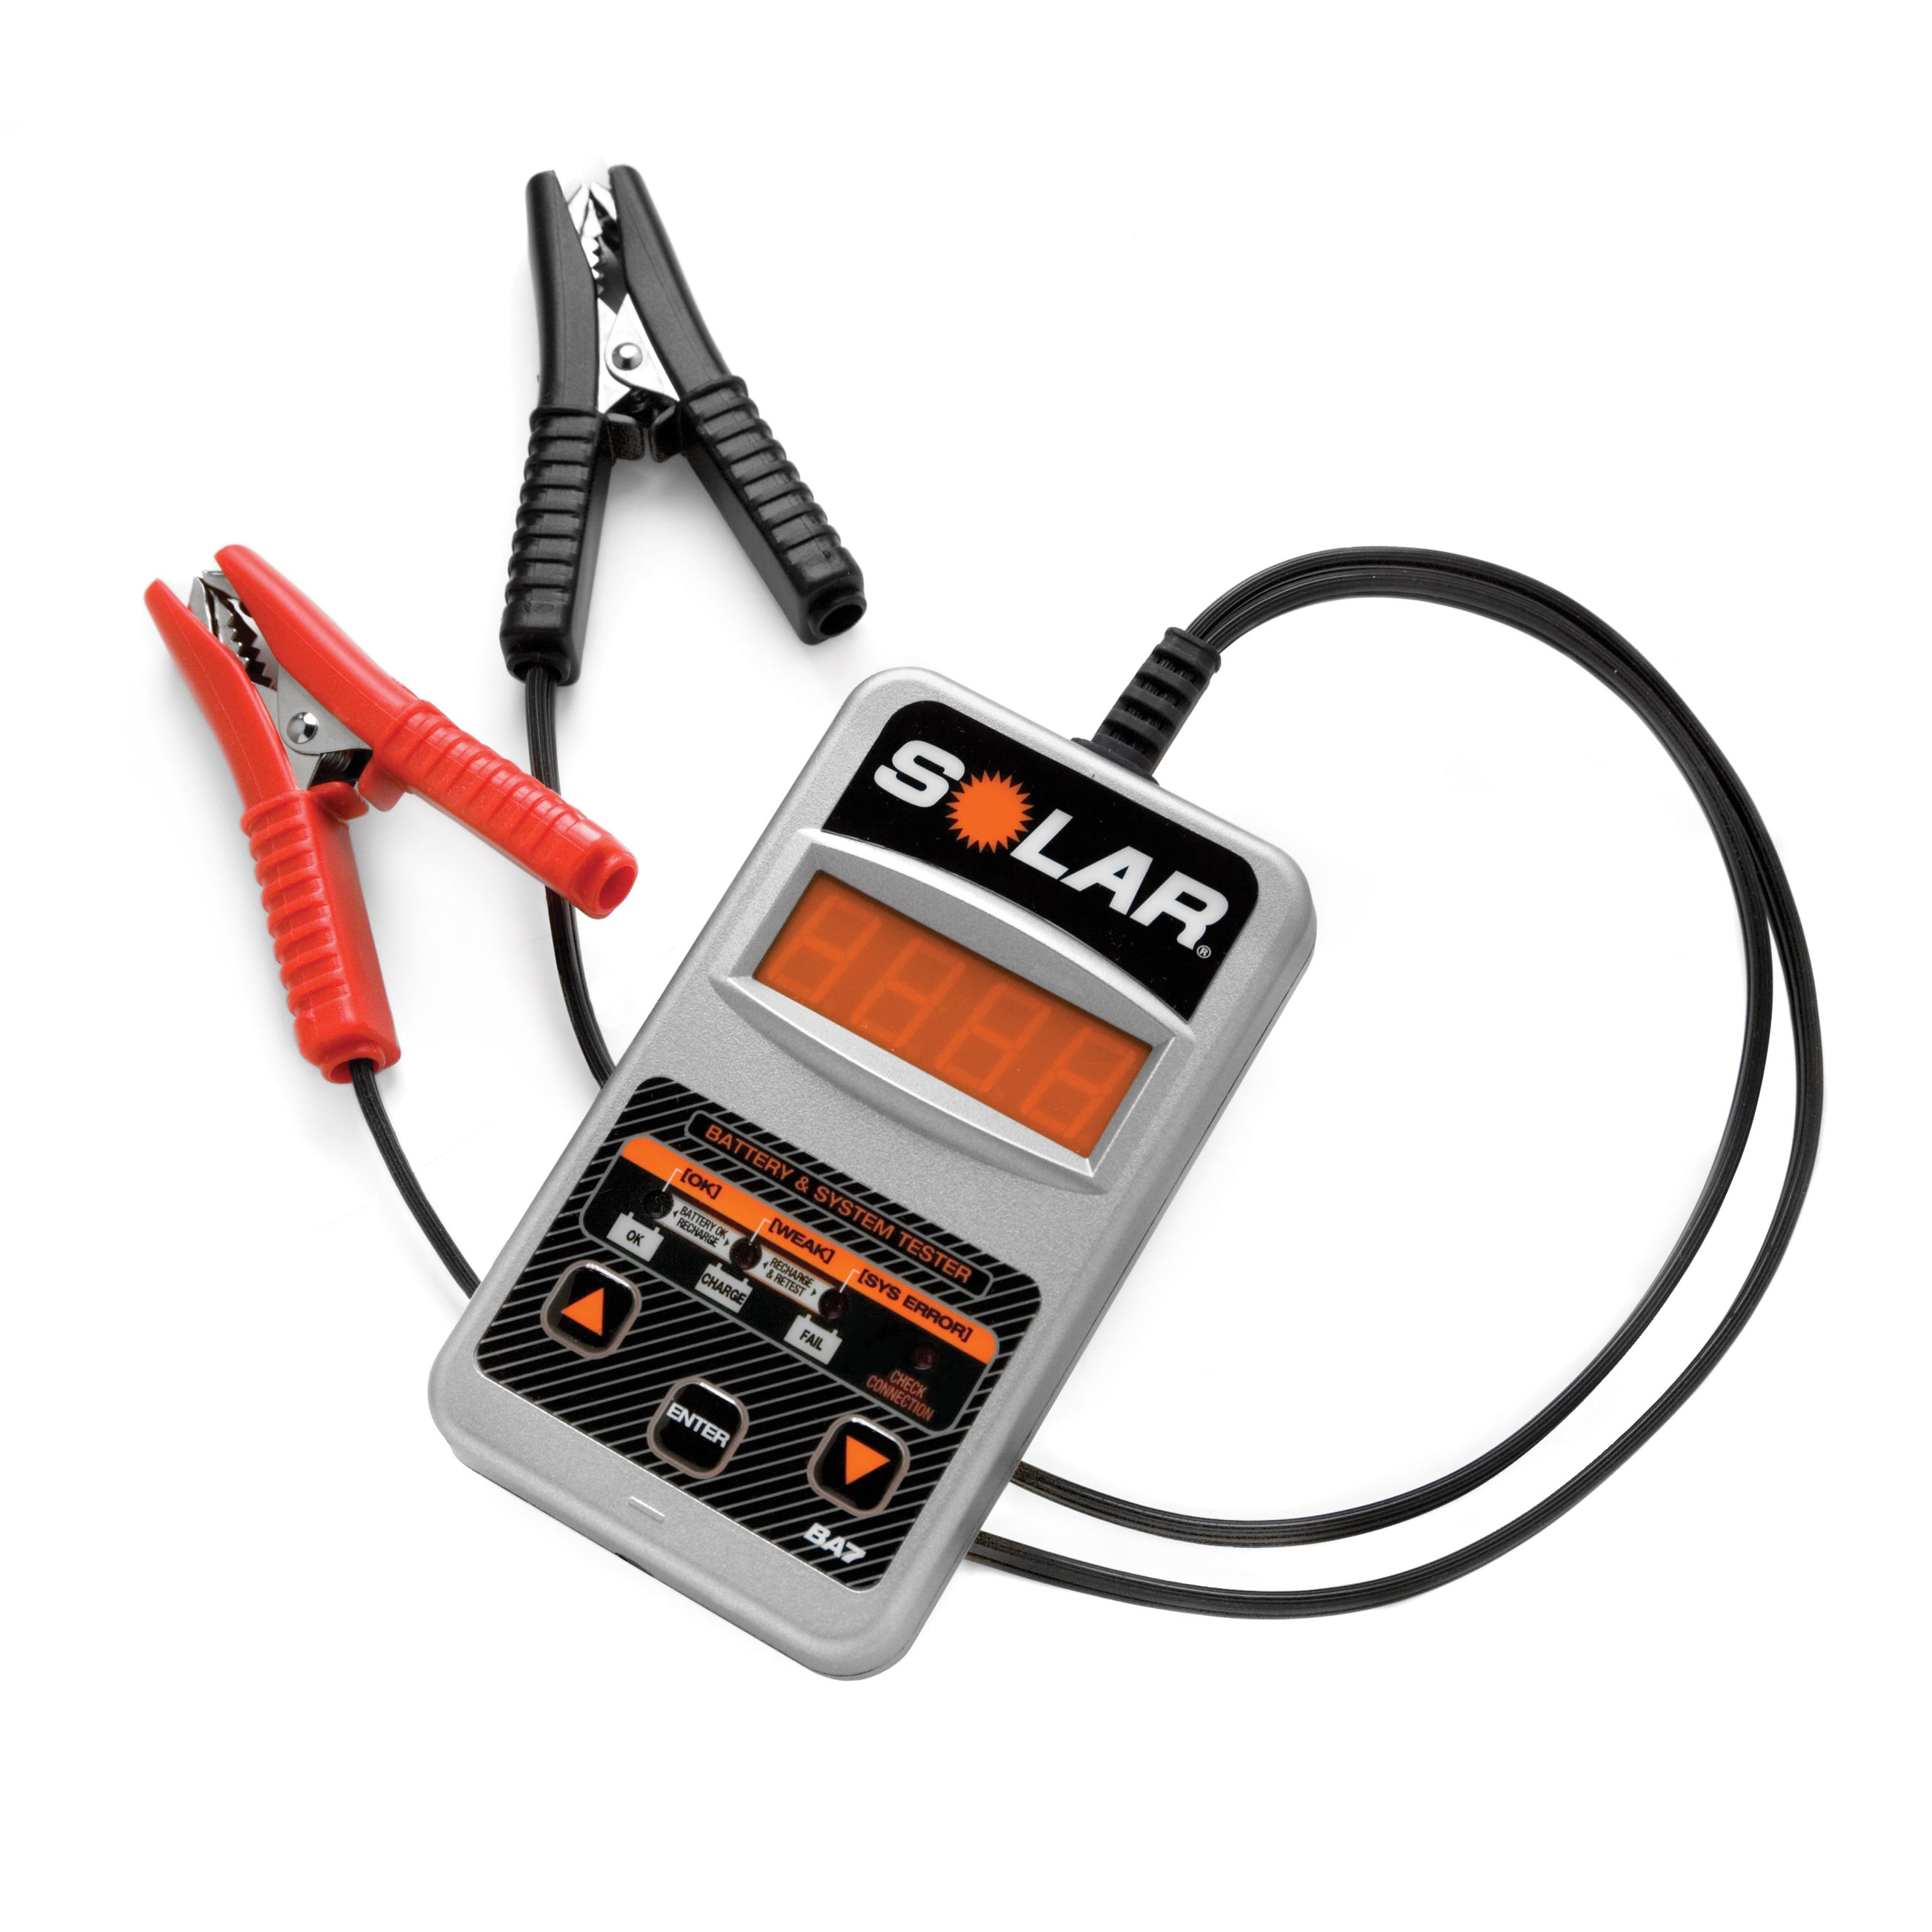 Overstock.com Solar BA7 100-1200 CCA Electronic Battery Tester